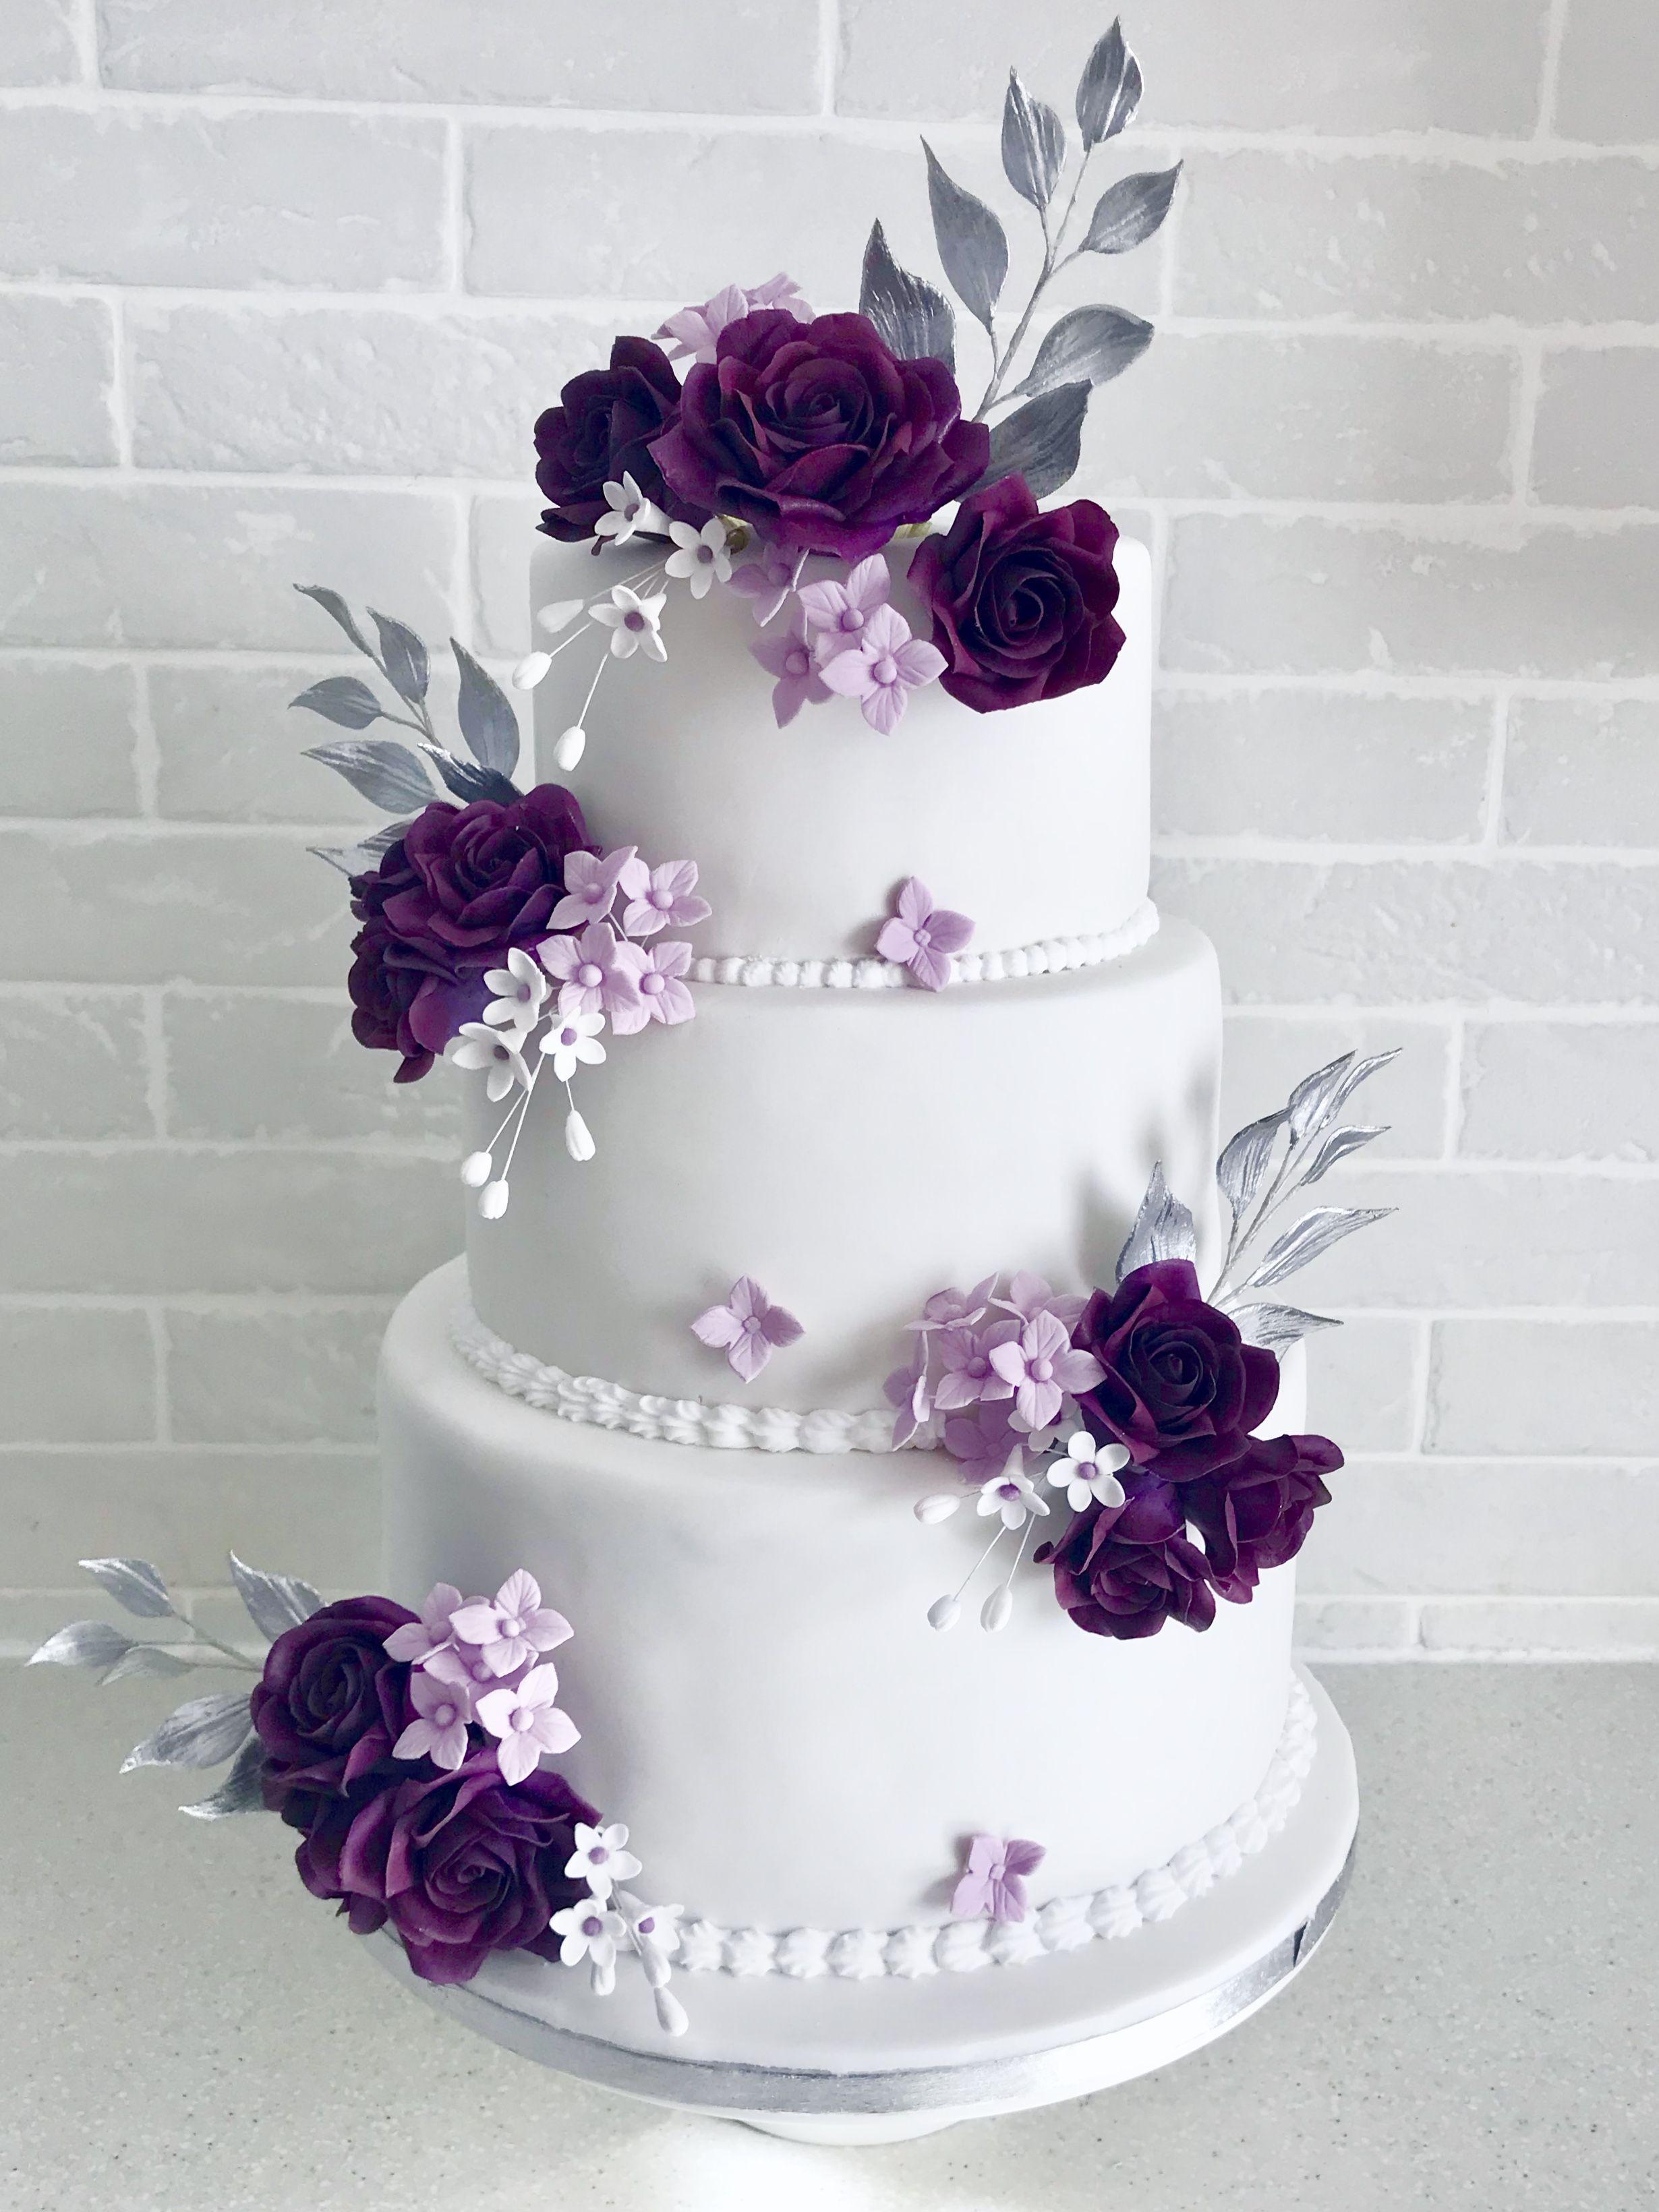 Plum Truffle Rose Wedding Cake